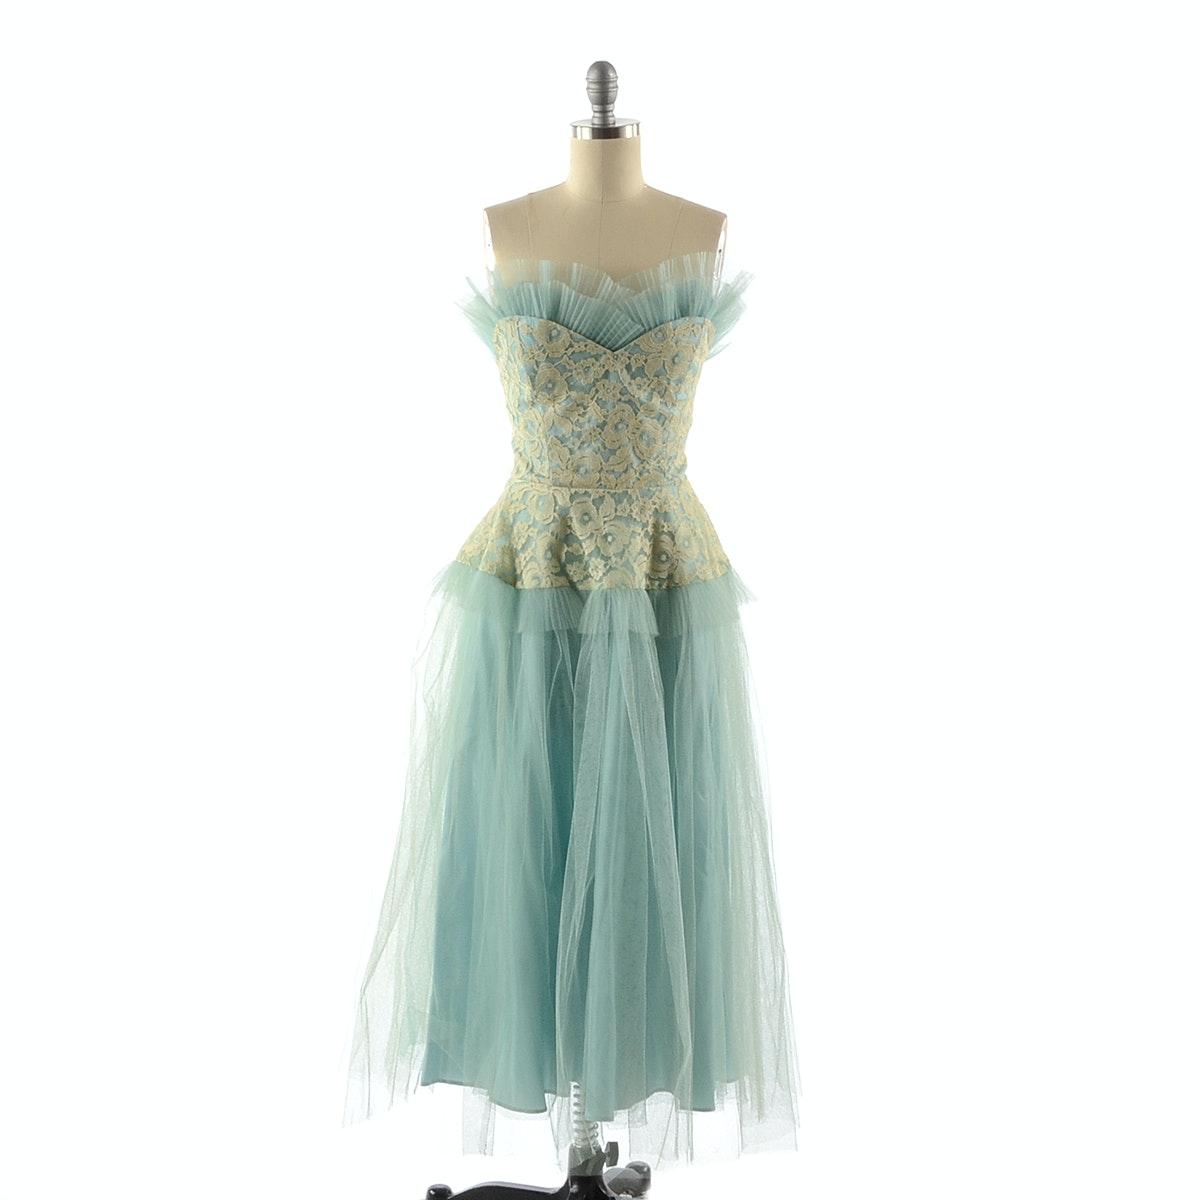 Circa 1950s Party Dress